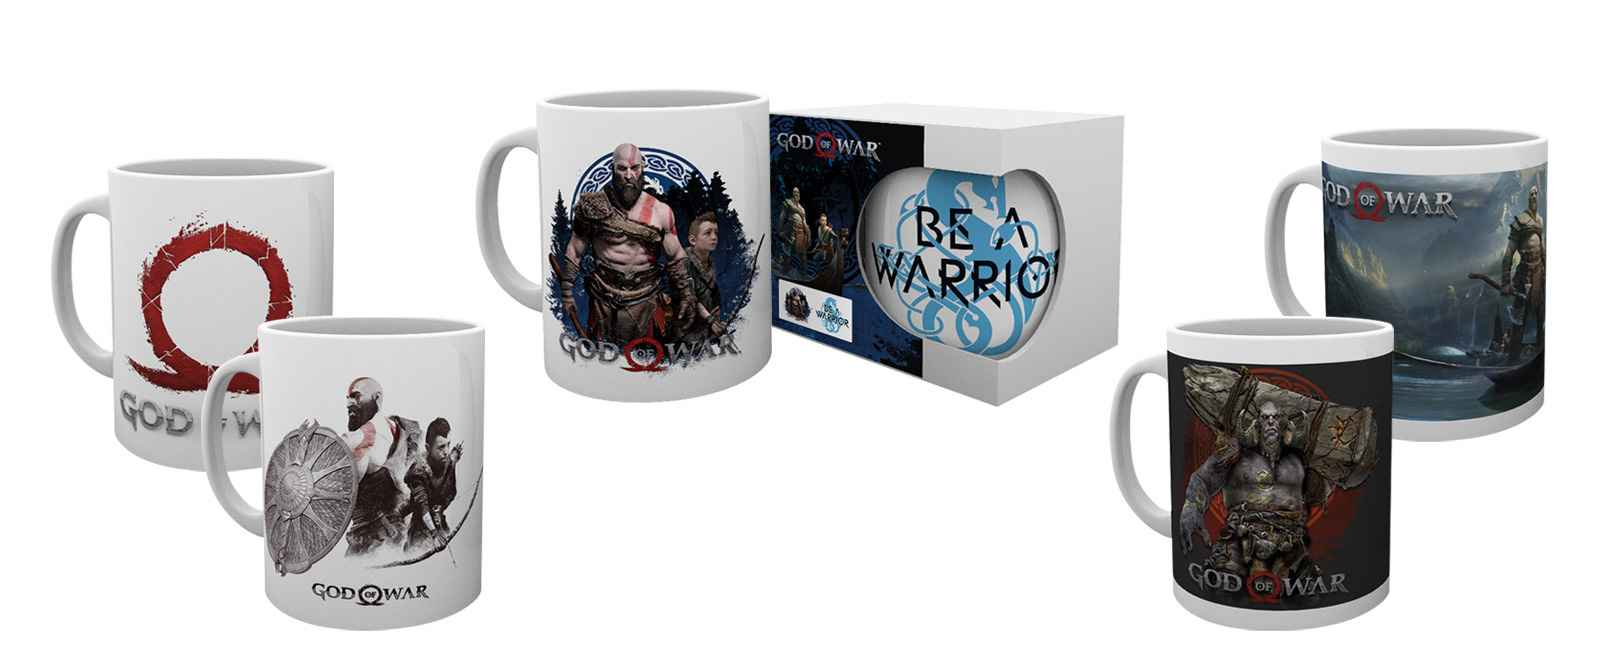 god of war mugs